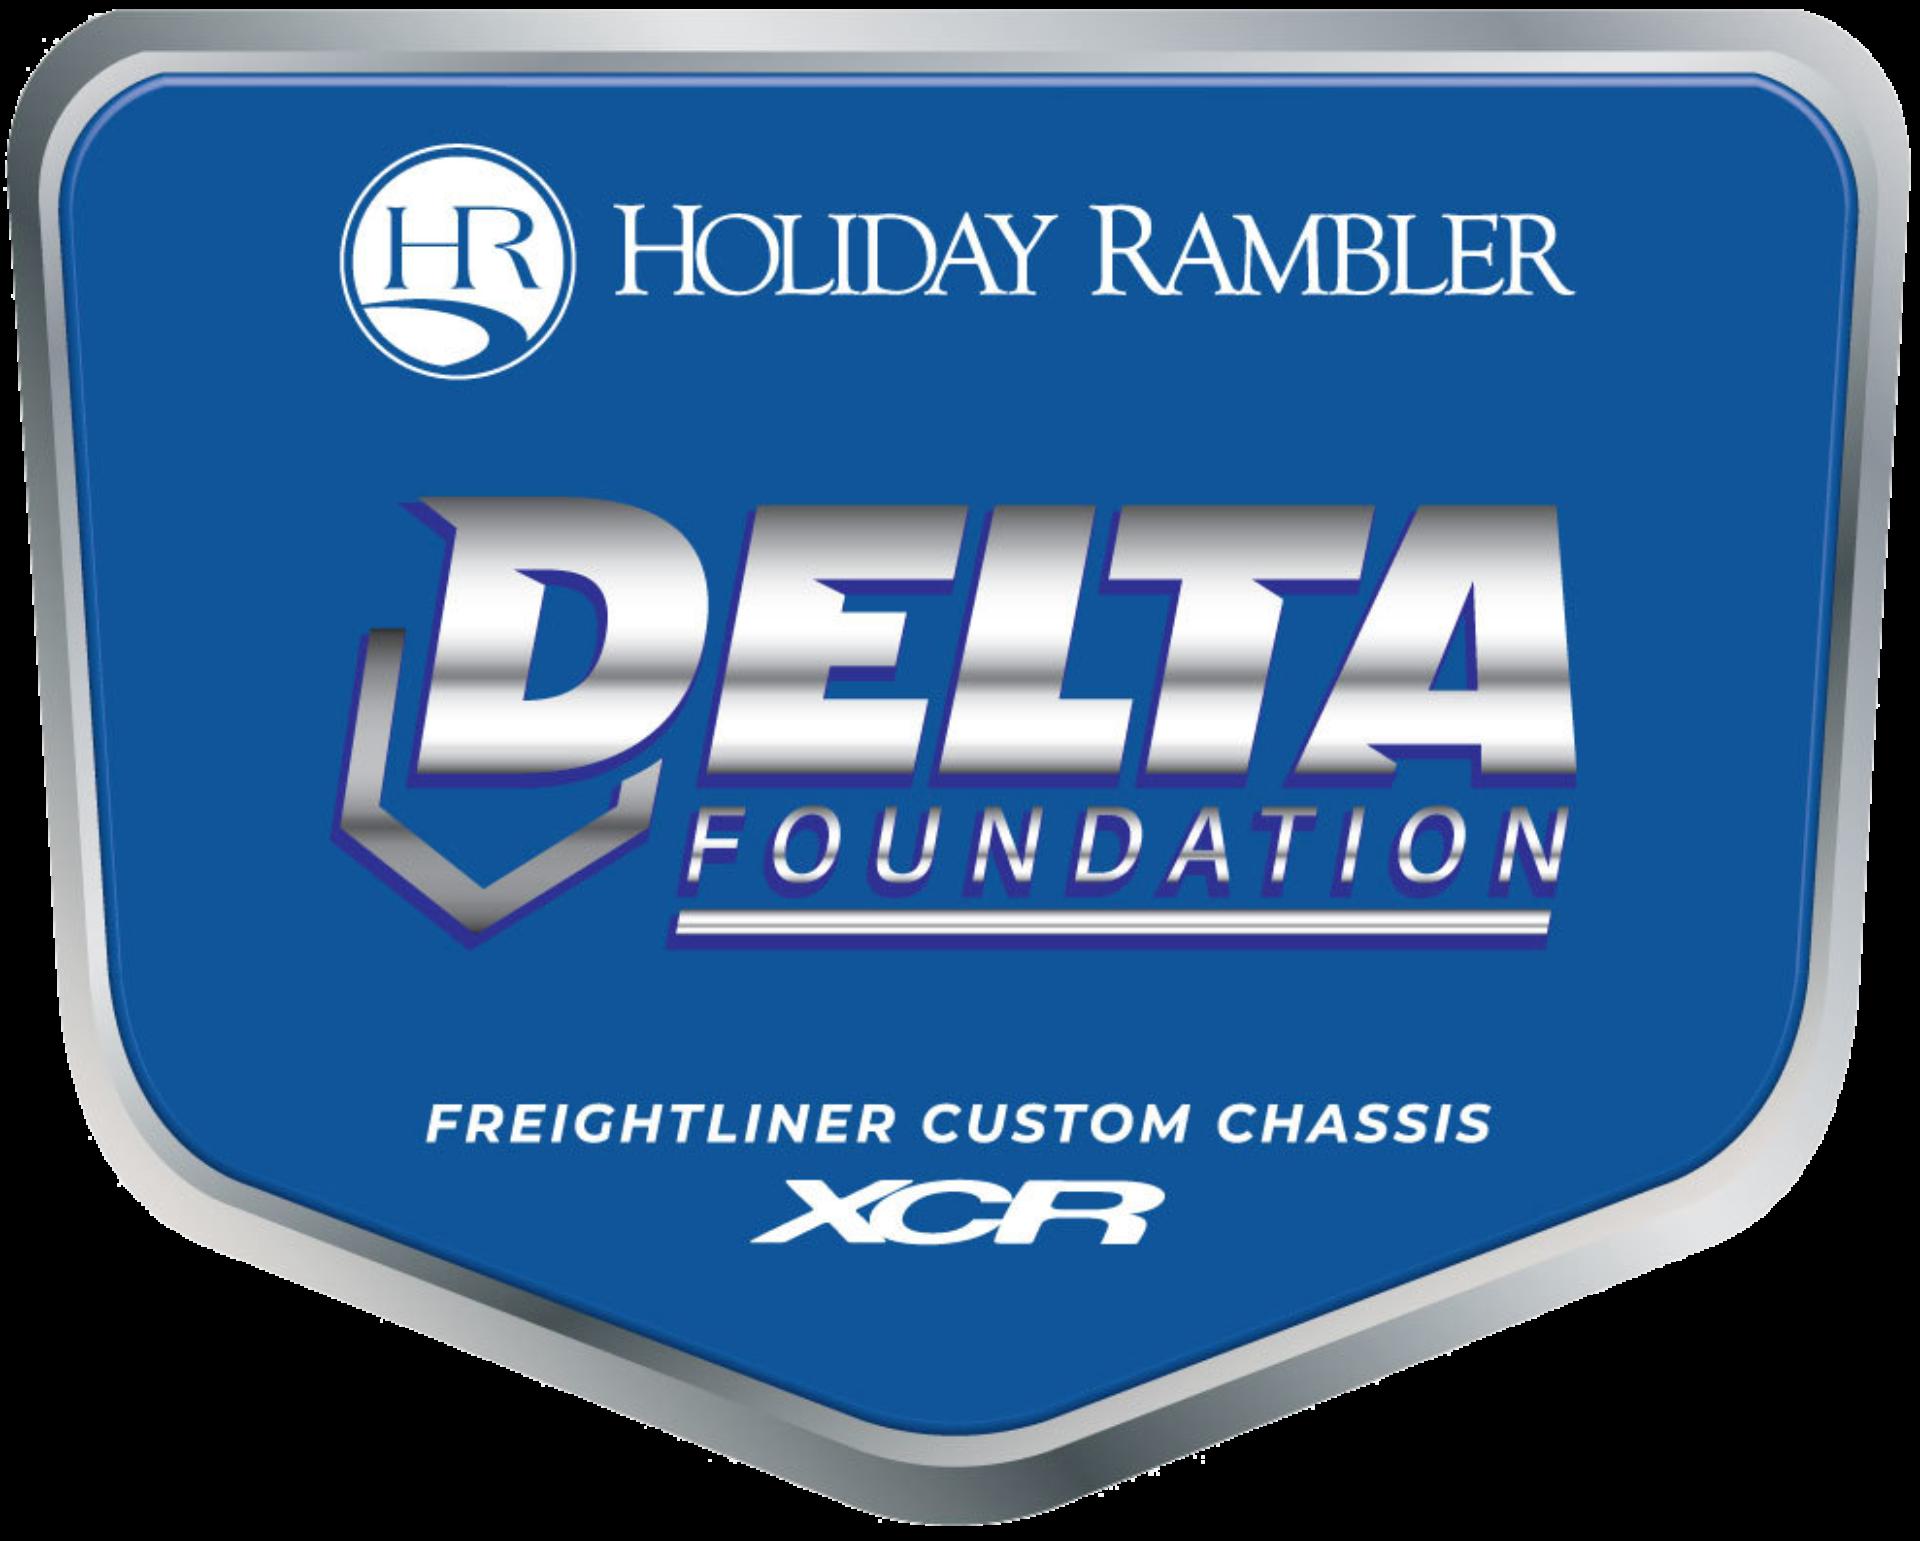 DELTA Foundation Badge XCR